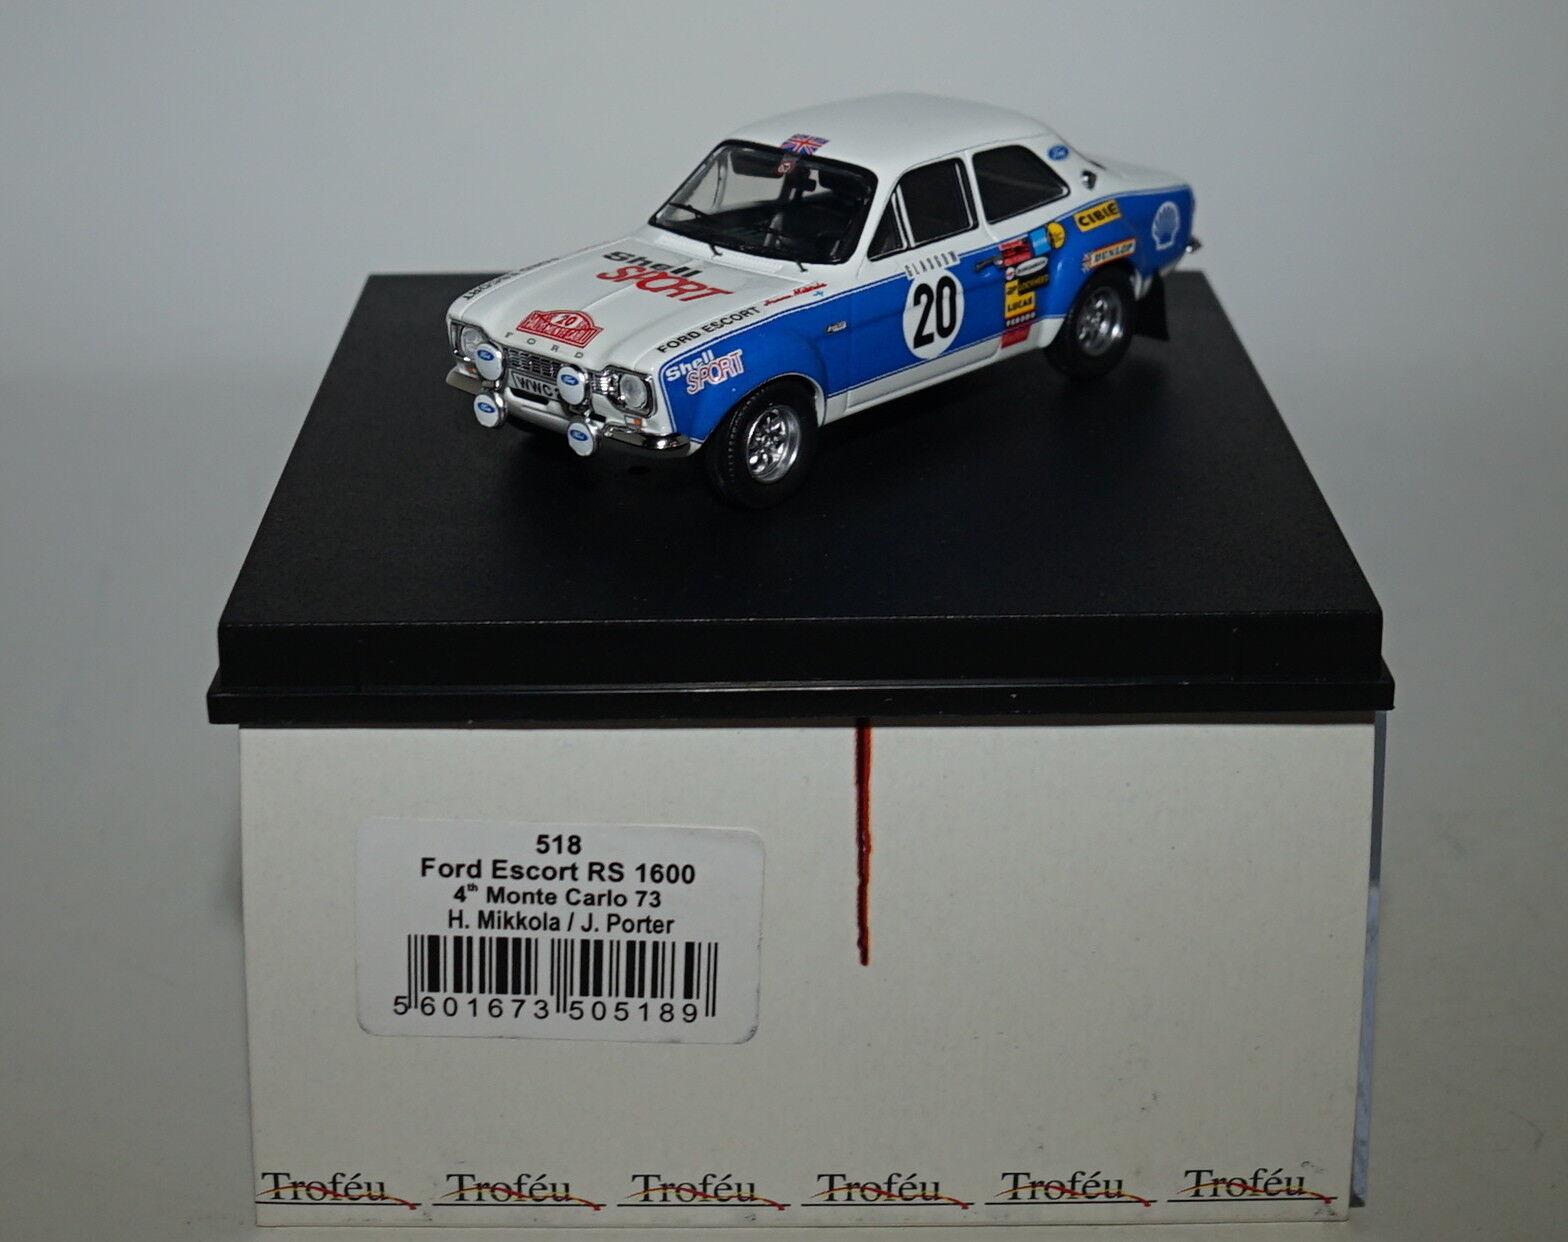 TROFEU 518 FORD ESCORT RS 160 4th Monte Carlo, 73 73 73 H. Mikkola J. Porter  20 en 1 43 3a43fd